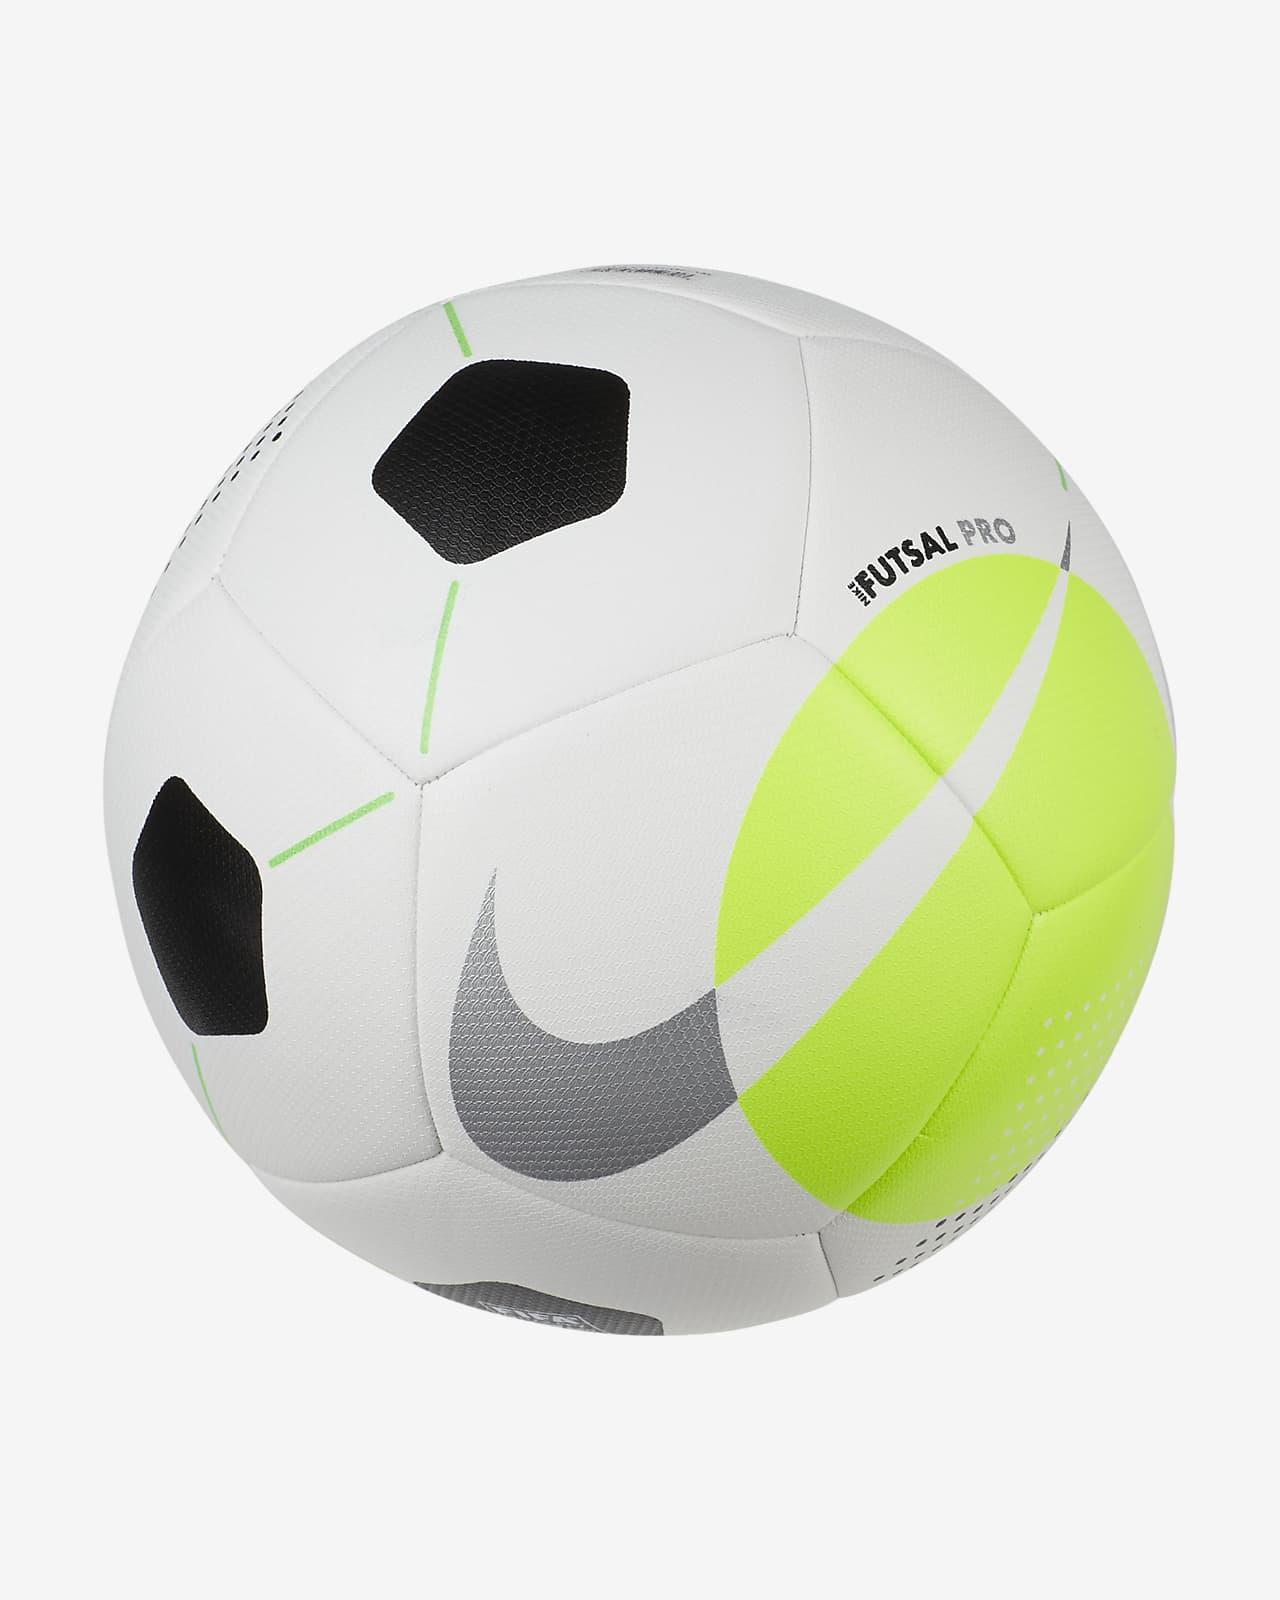 Nike Futsal Pro Soccer Ball